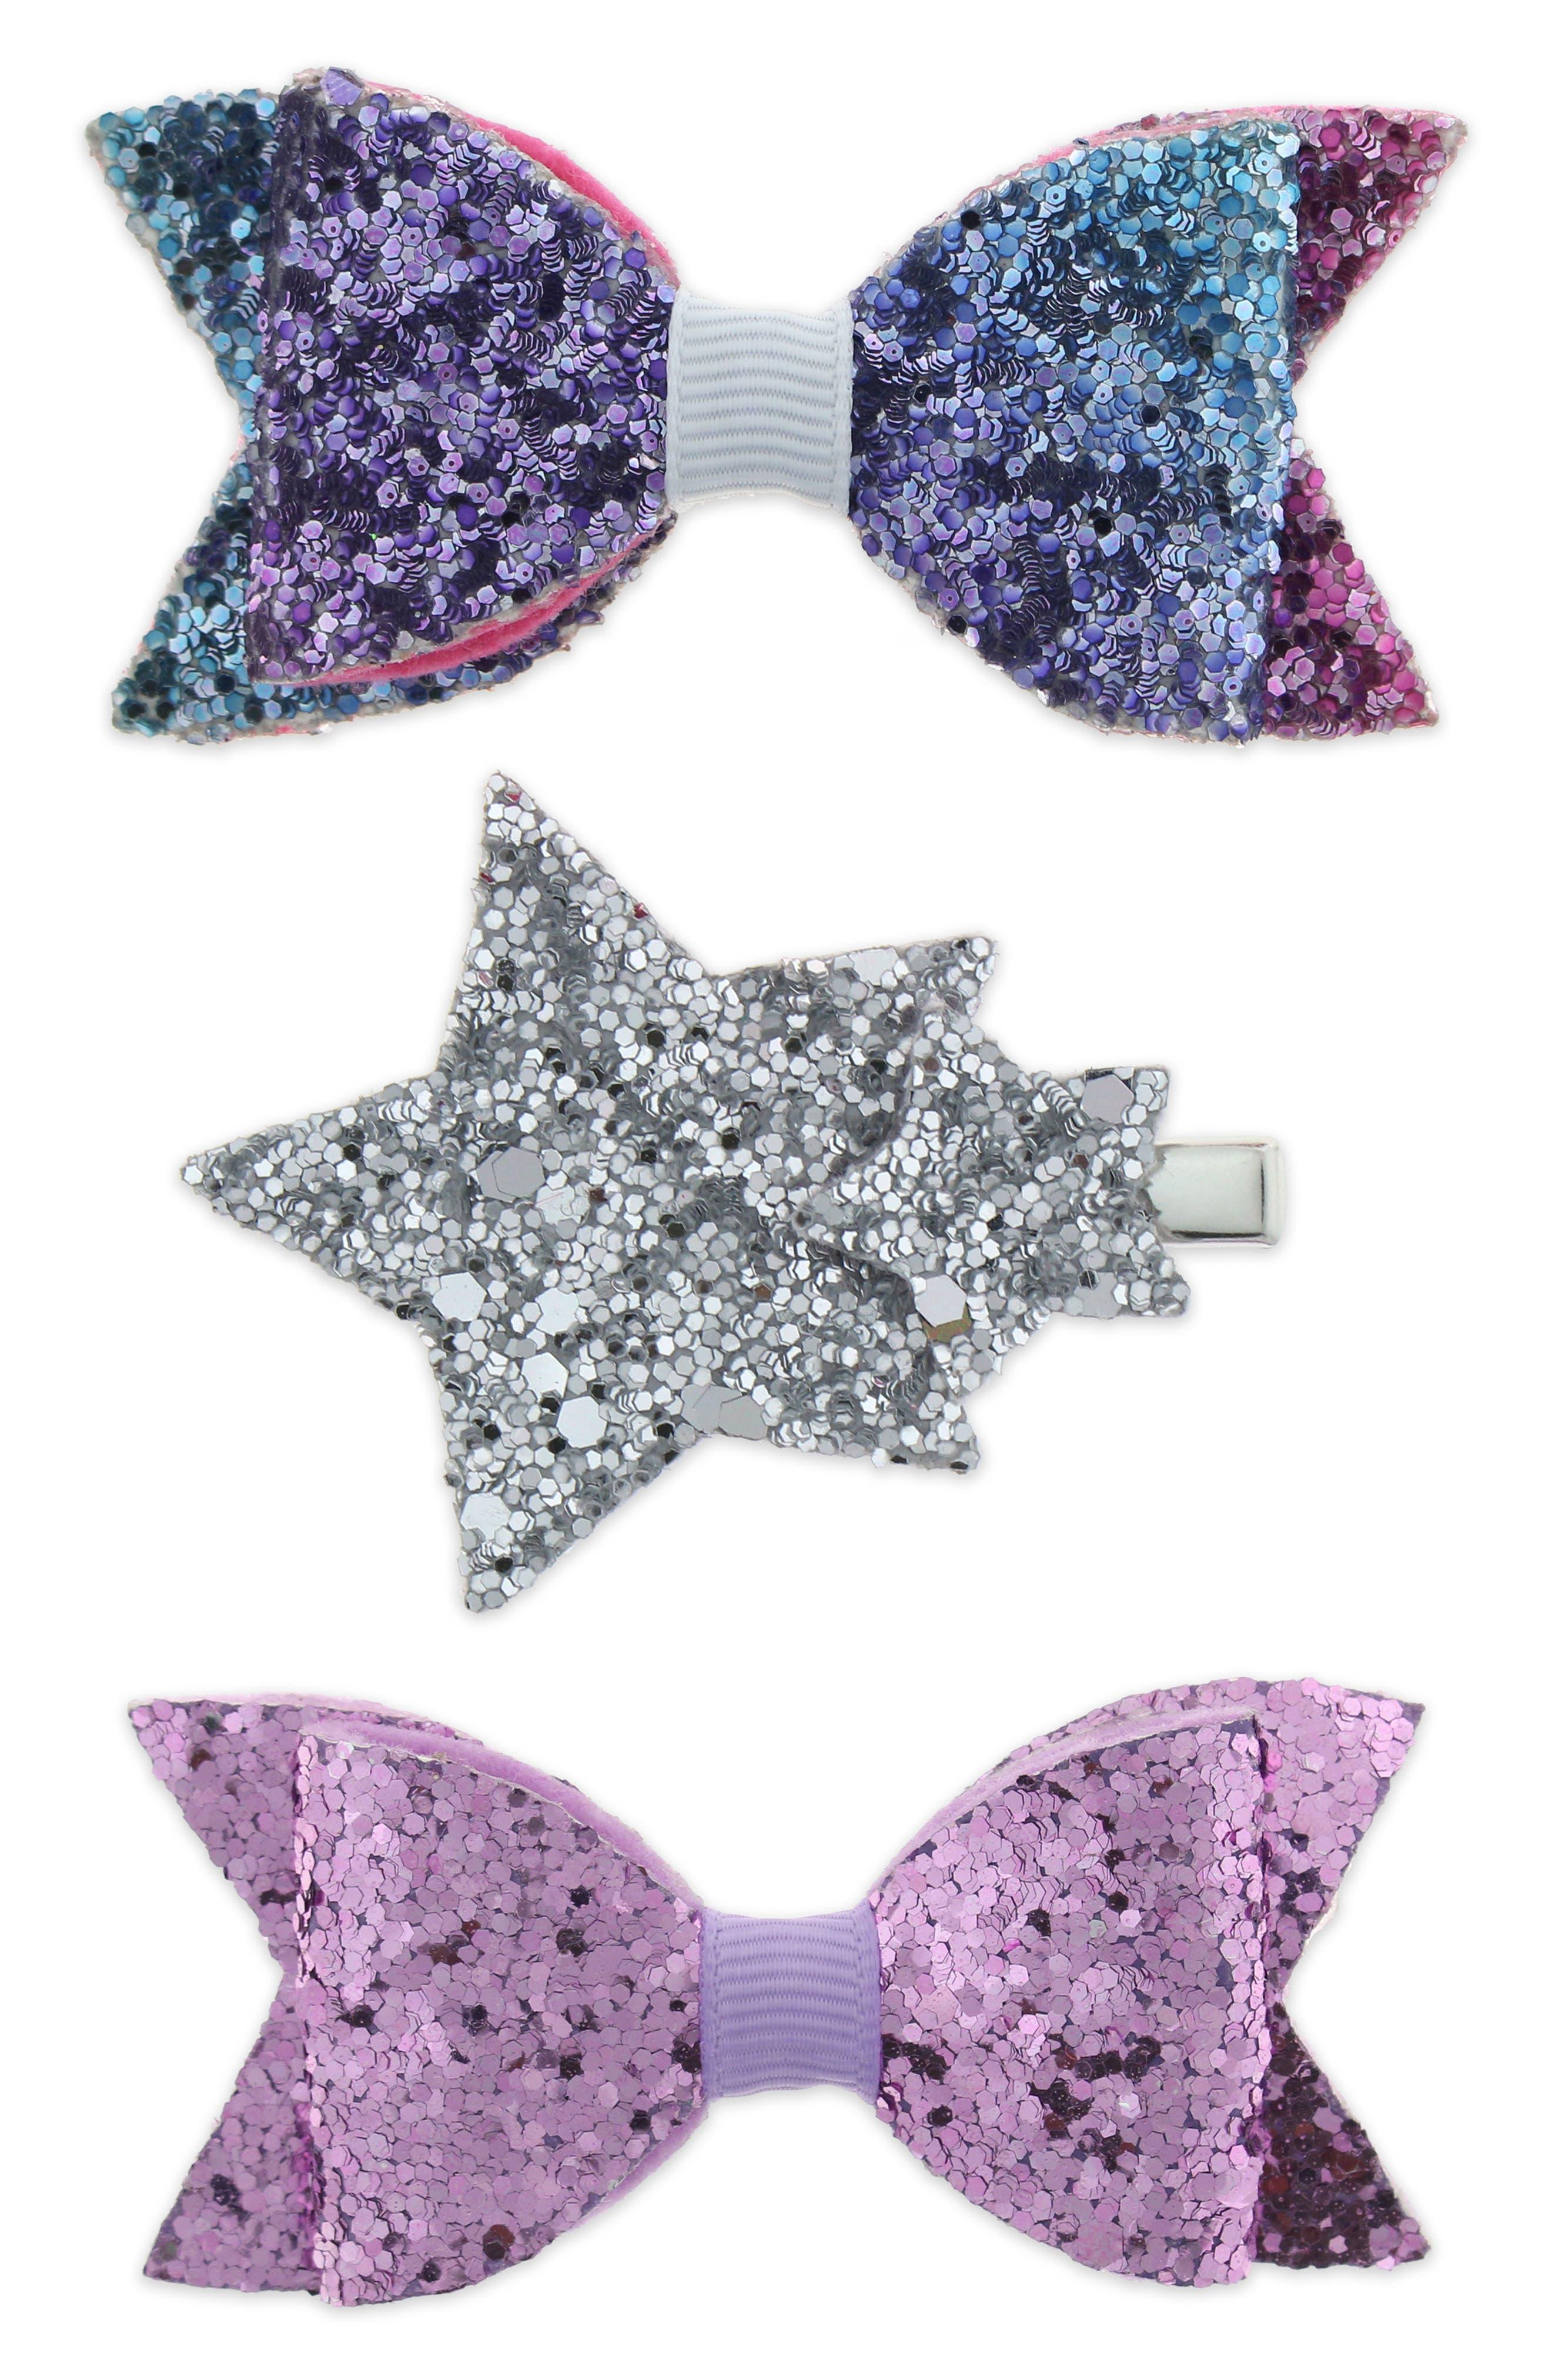 Glitter Bow Star 3-Piece Hair Clip Set,                             Main thumbnail 1, color,                             650